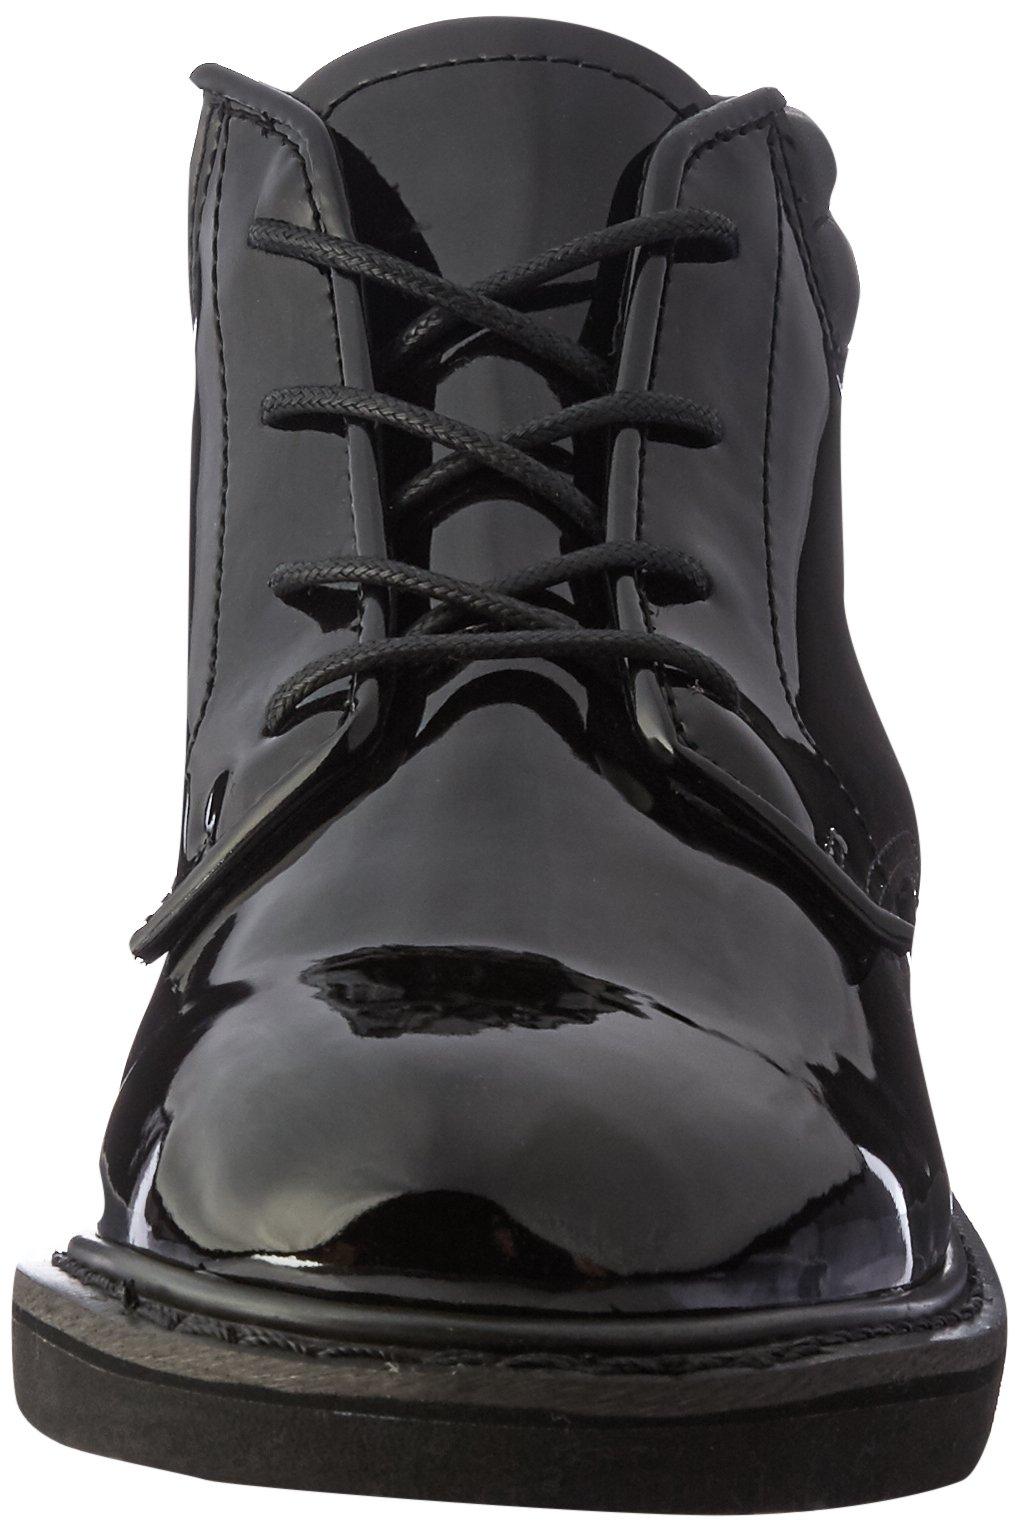 Rocky Men's 6 Inch Professional Dress 500-8 Work Boot,Black,10 XW US by Rocky (Image #4)